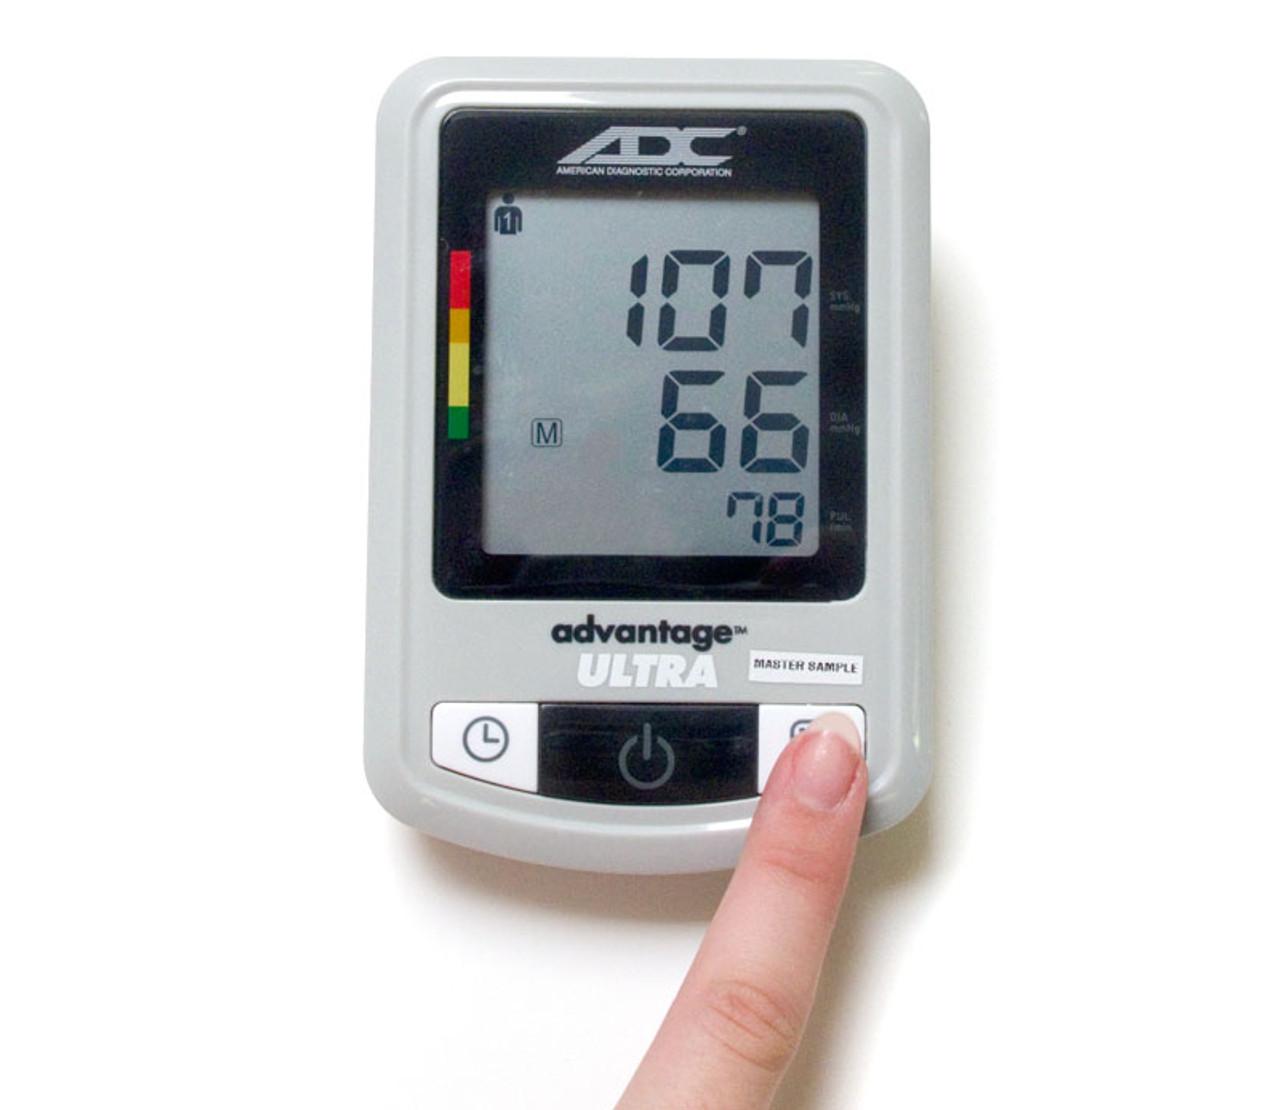 ADC 6022N Advantage? Plus Automatic BP Monitor